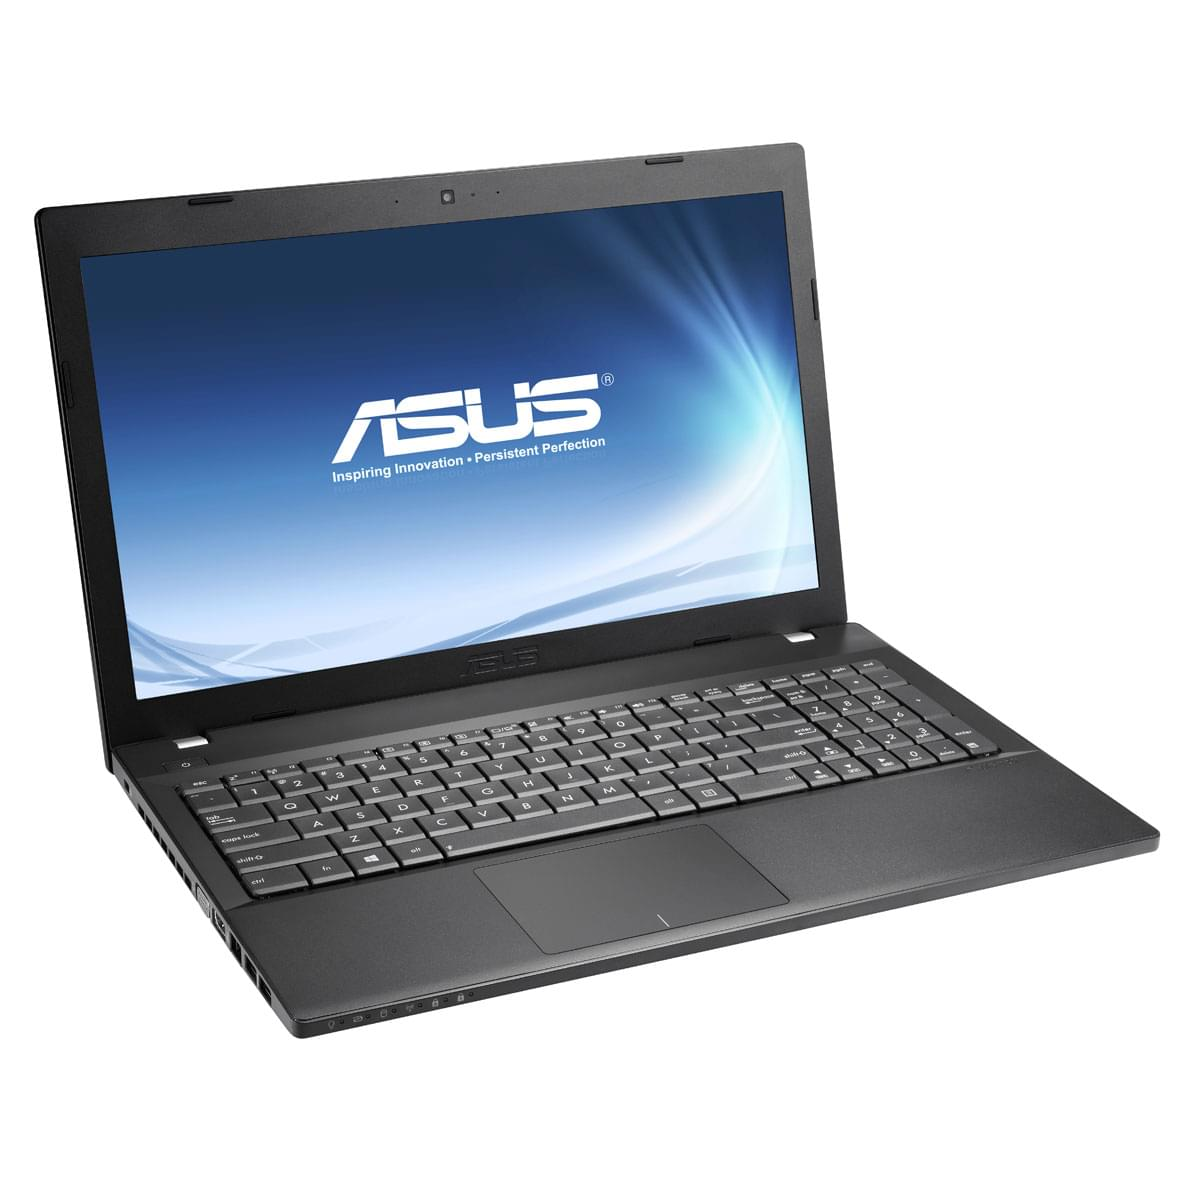 Asus X550CC-CJ739H (X550CC-CJ739H) - Achat / Vente PC Portable sur Cybertek.fr - 0